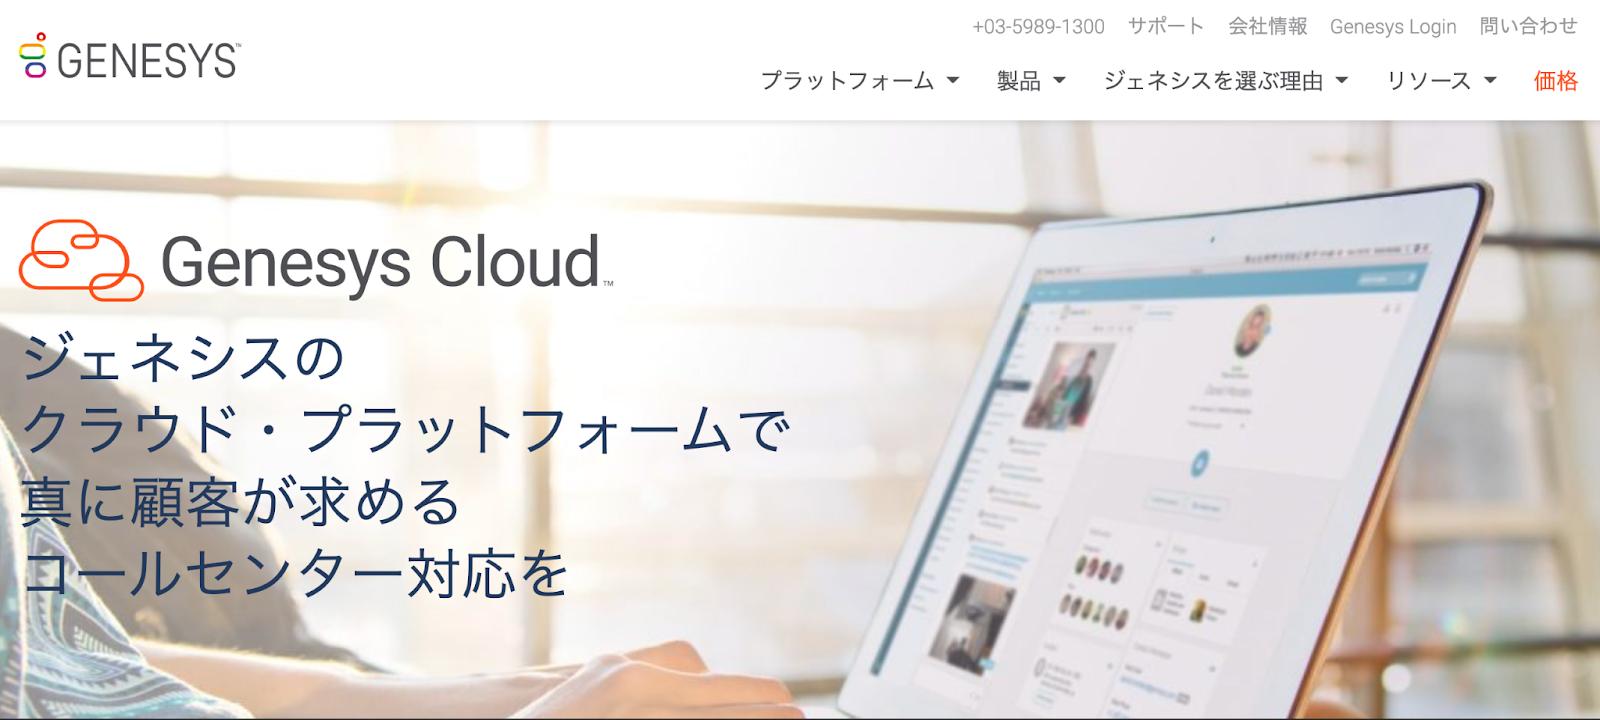 Genesys Cloudキャプチャ